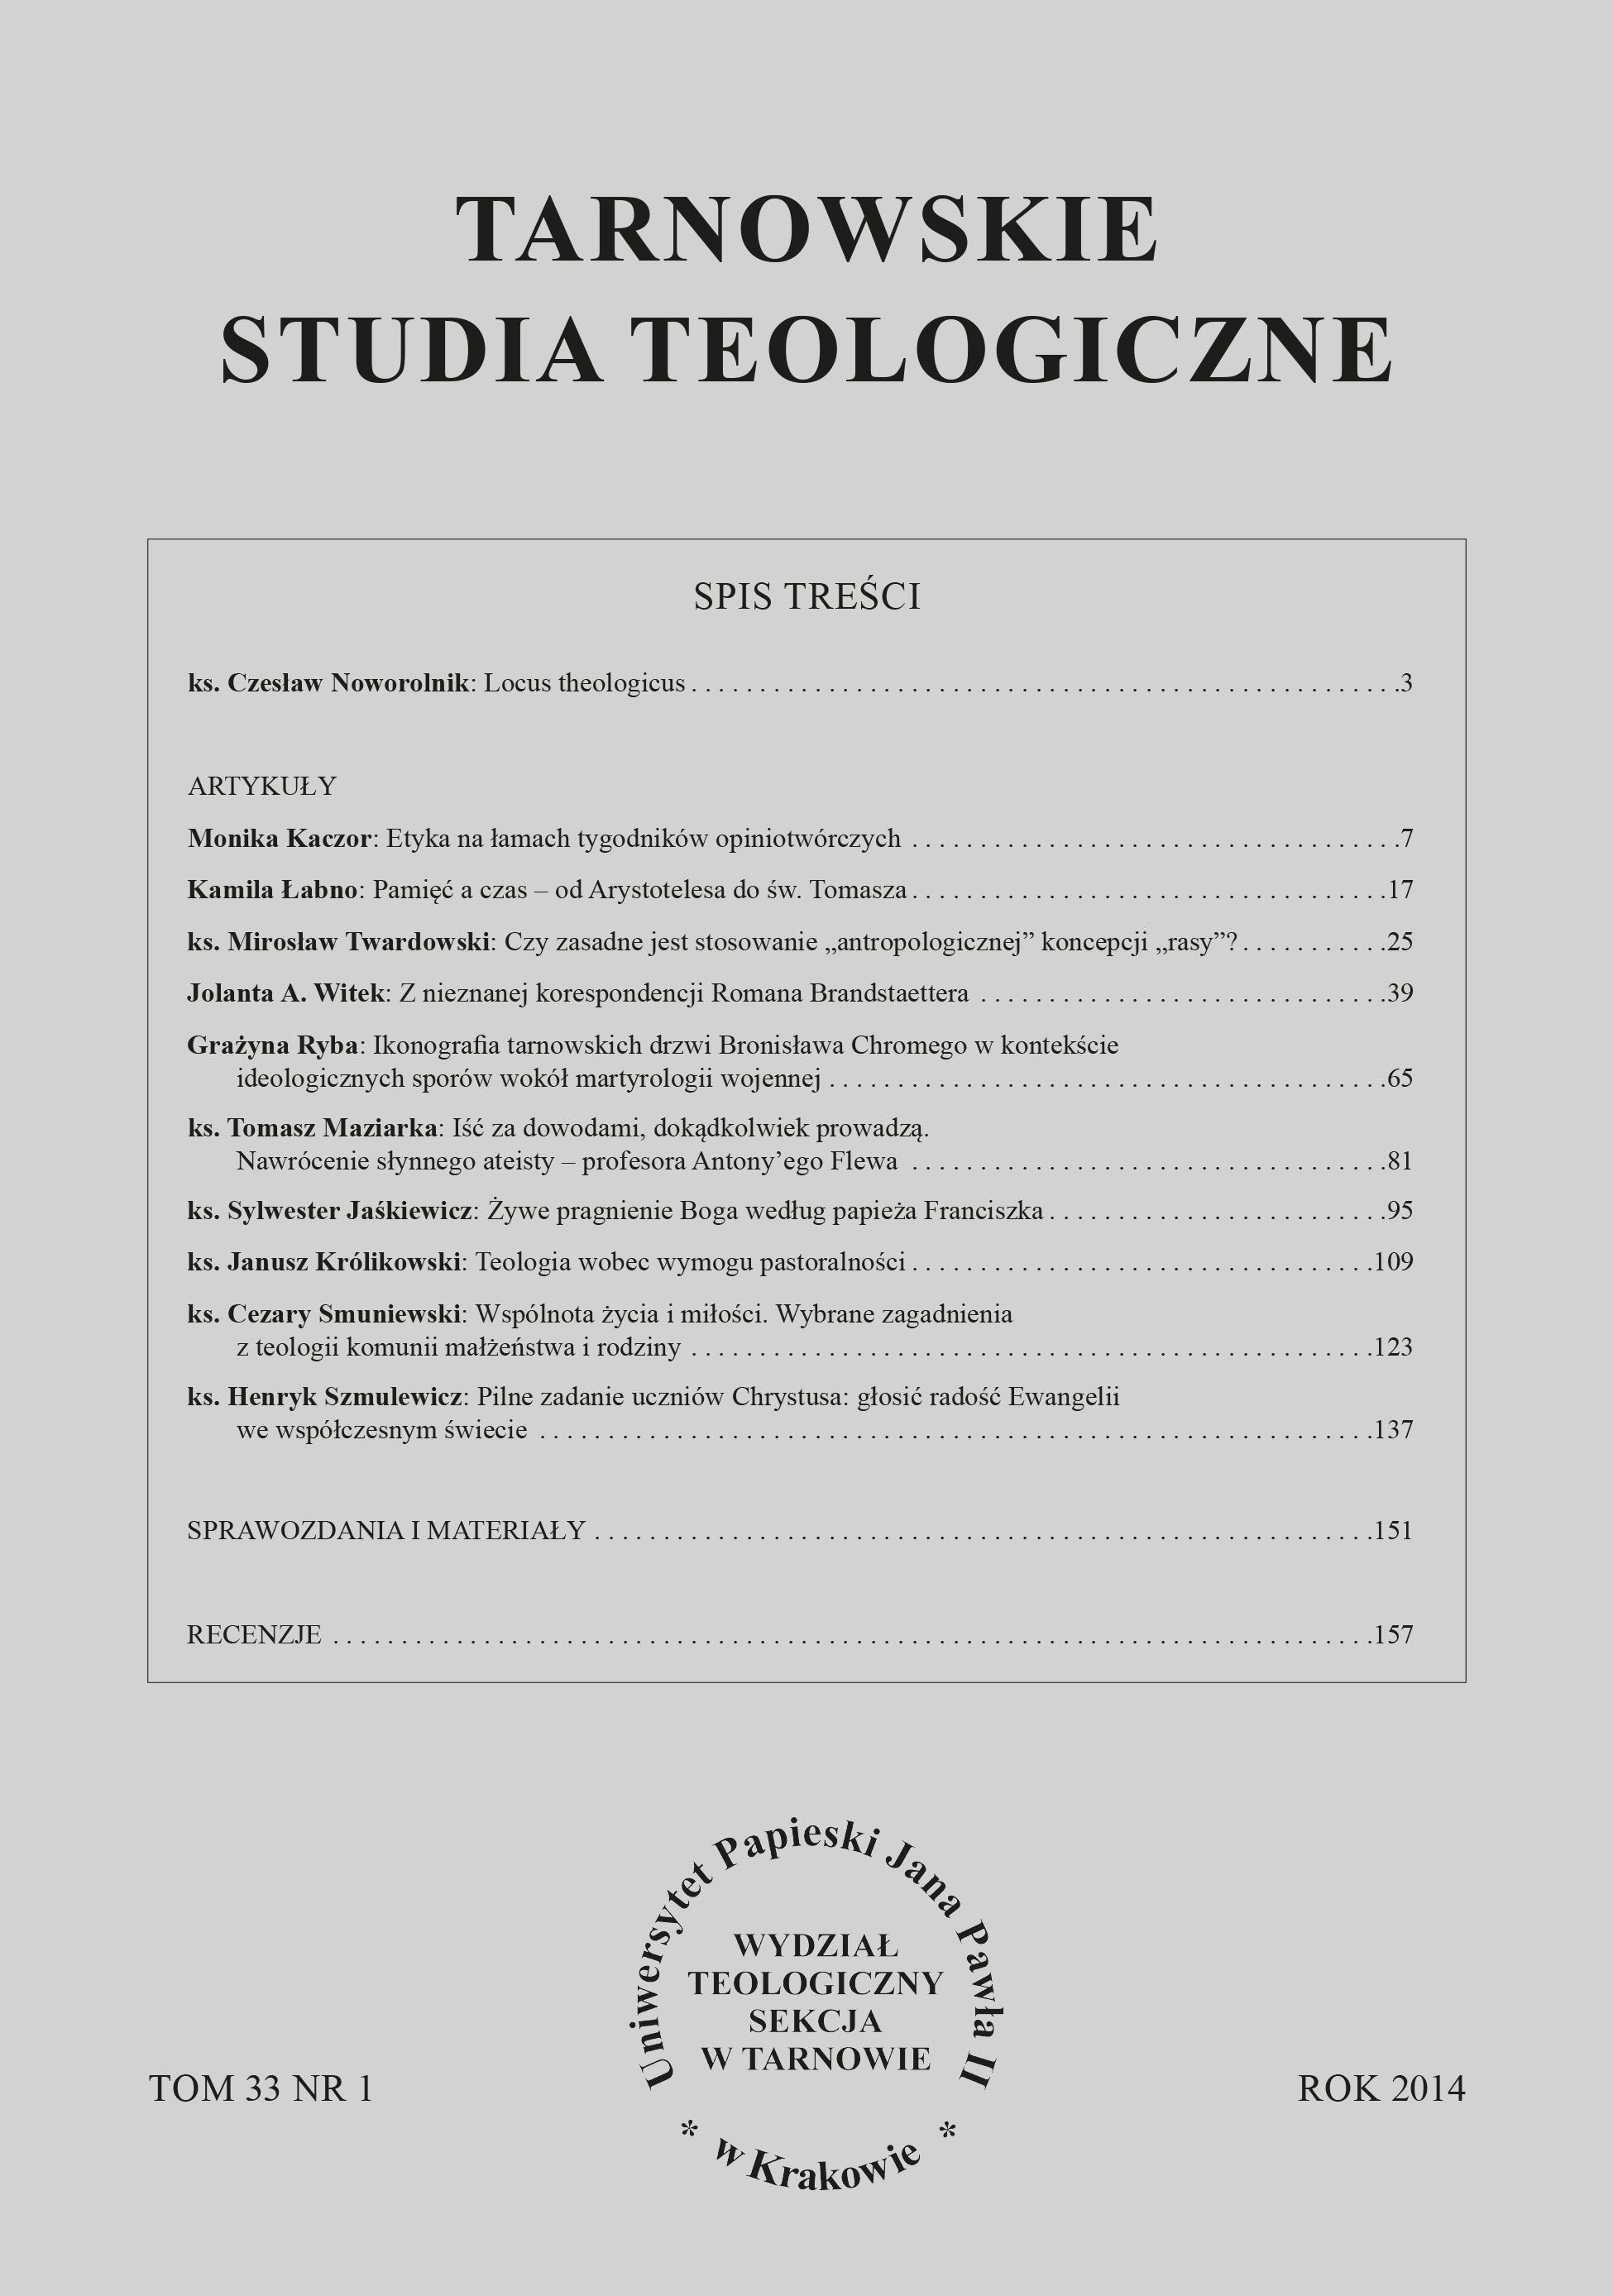 Tarnowskie Studia Teologiczne 33 (2014) nr 1